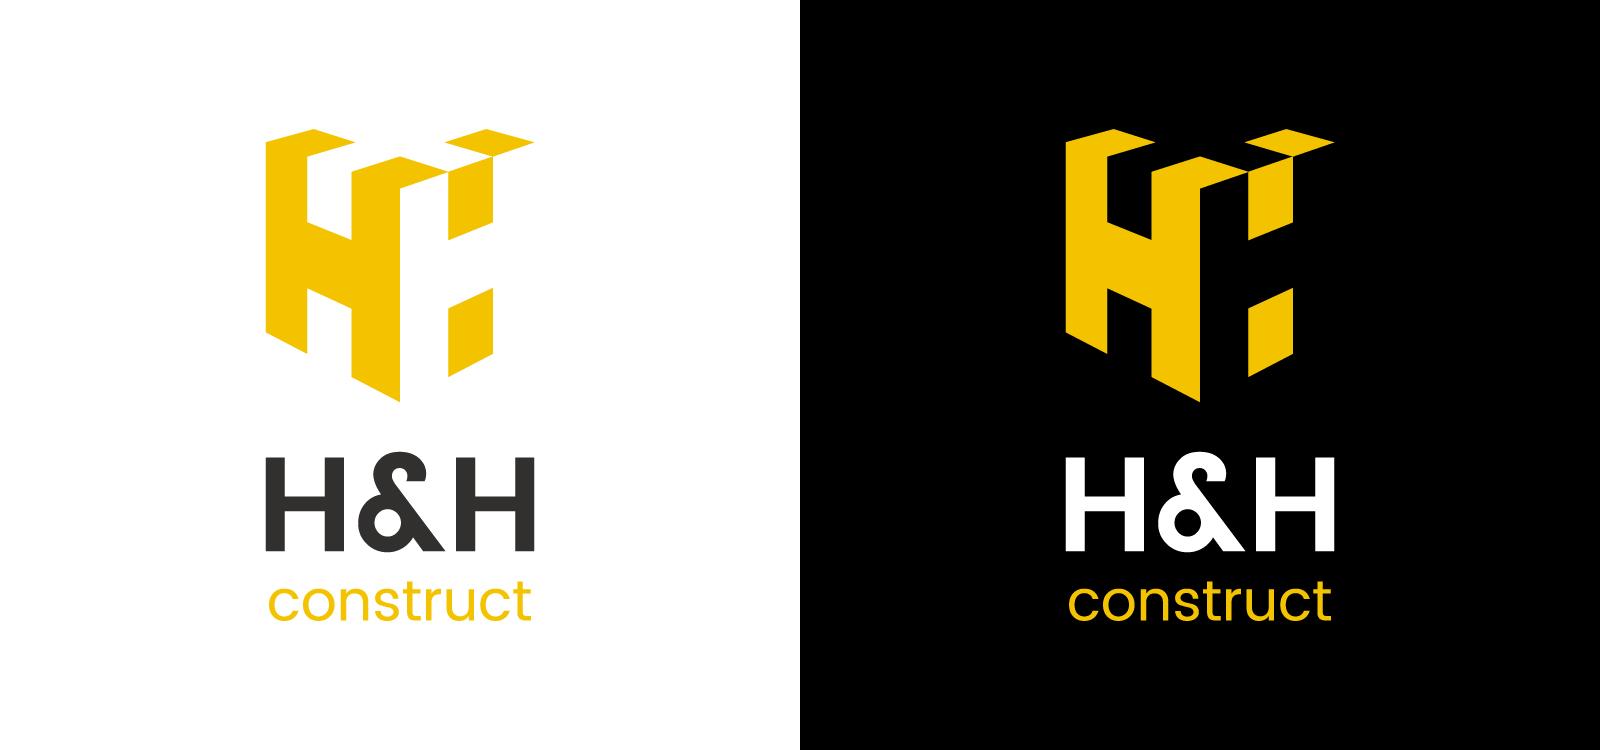 snedig-grafisch-ontwerp-logo-ontwerp-h&h-construct